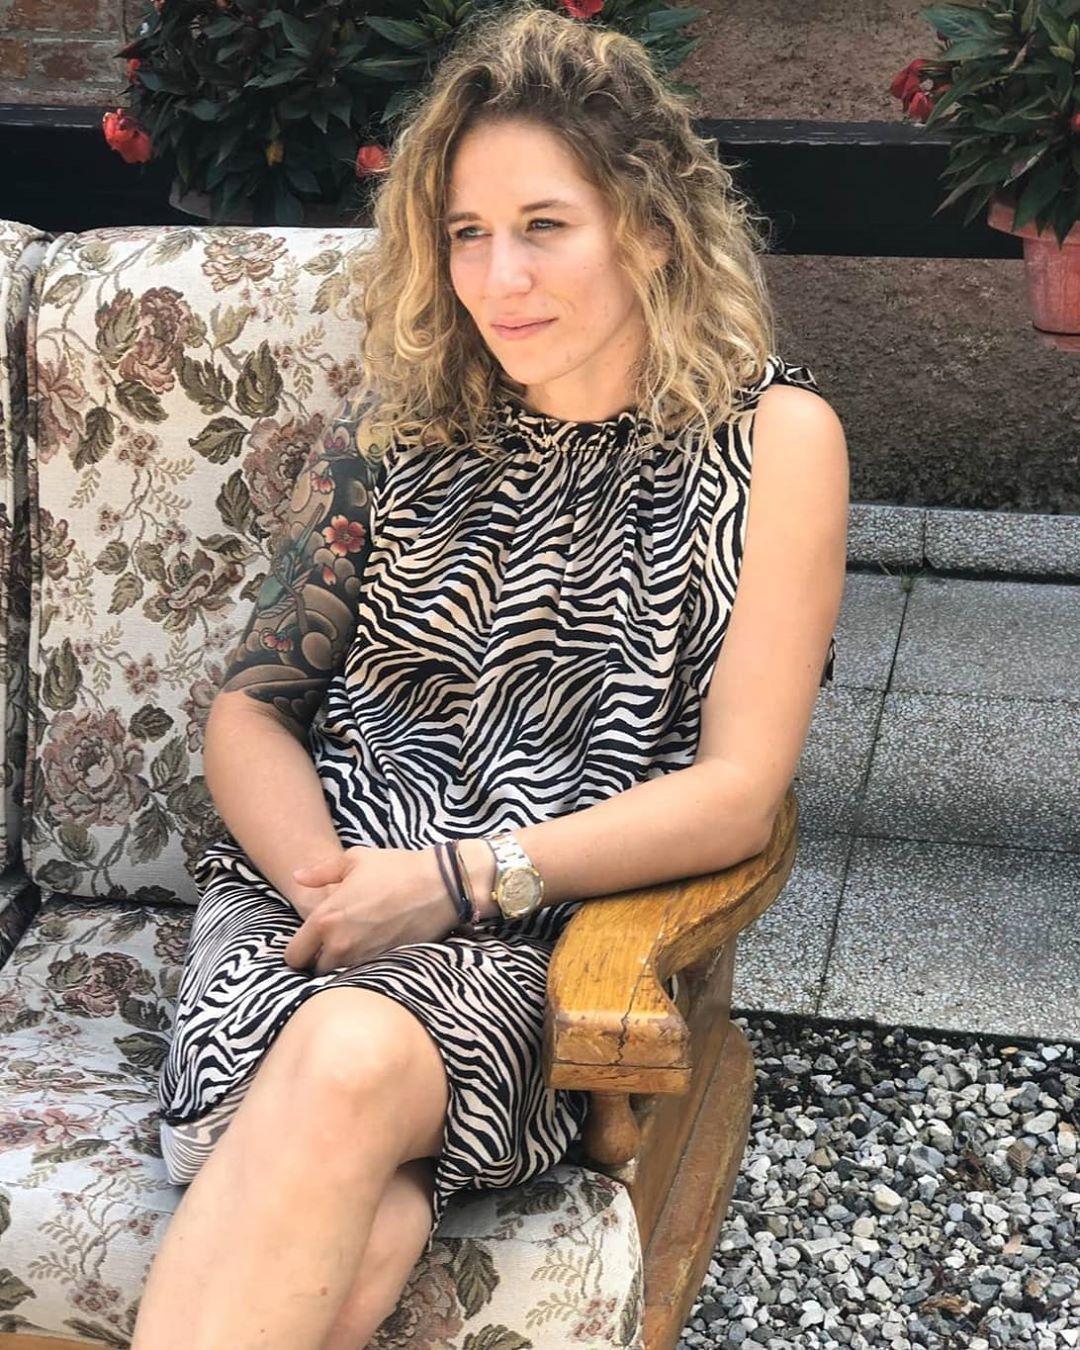 🦓 . . . . . . . . . . . . . . . . . . . . . . . . . . #summertime #summer #italiangirl #tattoos #tattooedgirls #inkedgirls #blonde #blondehair #blondegirl #blueeyes #curlyhair #curly #vsco #vscocam